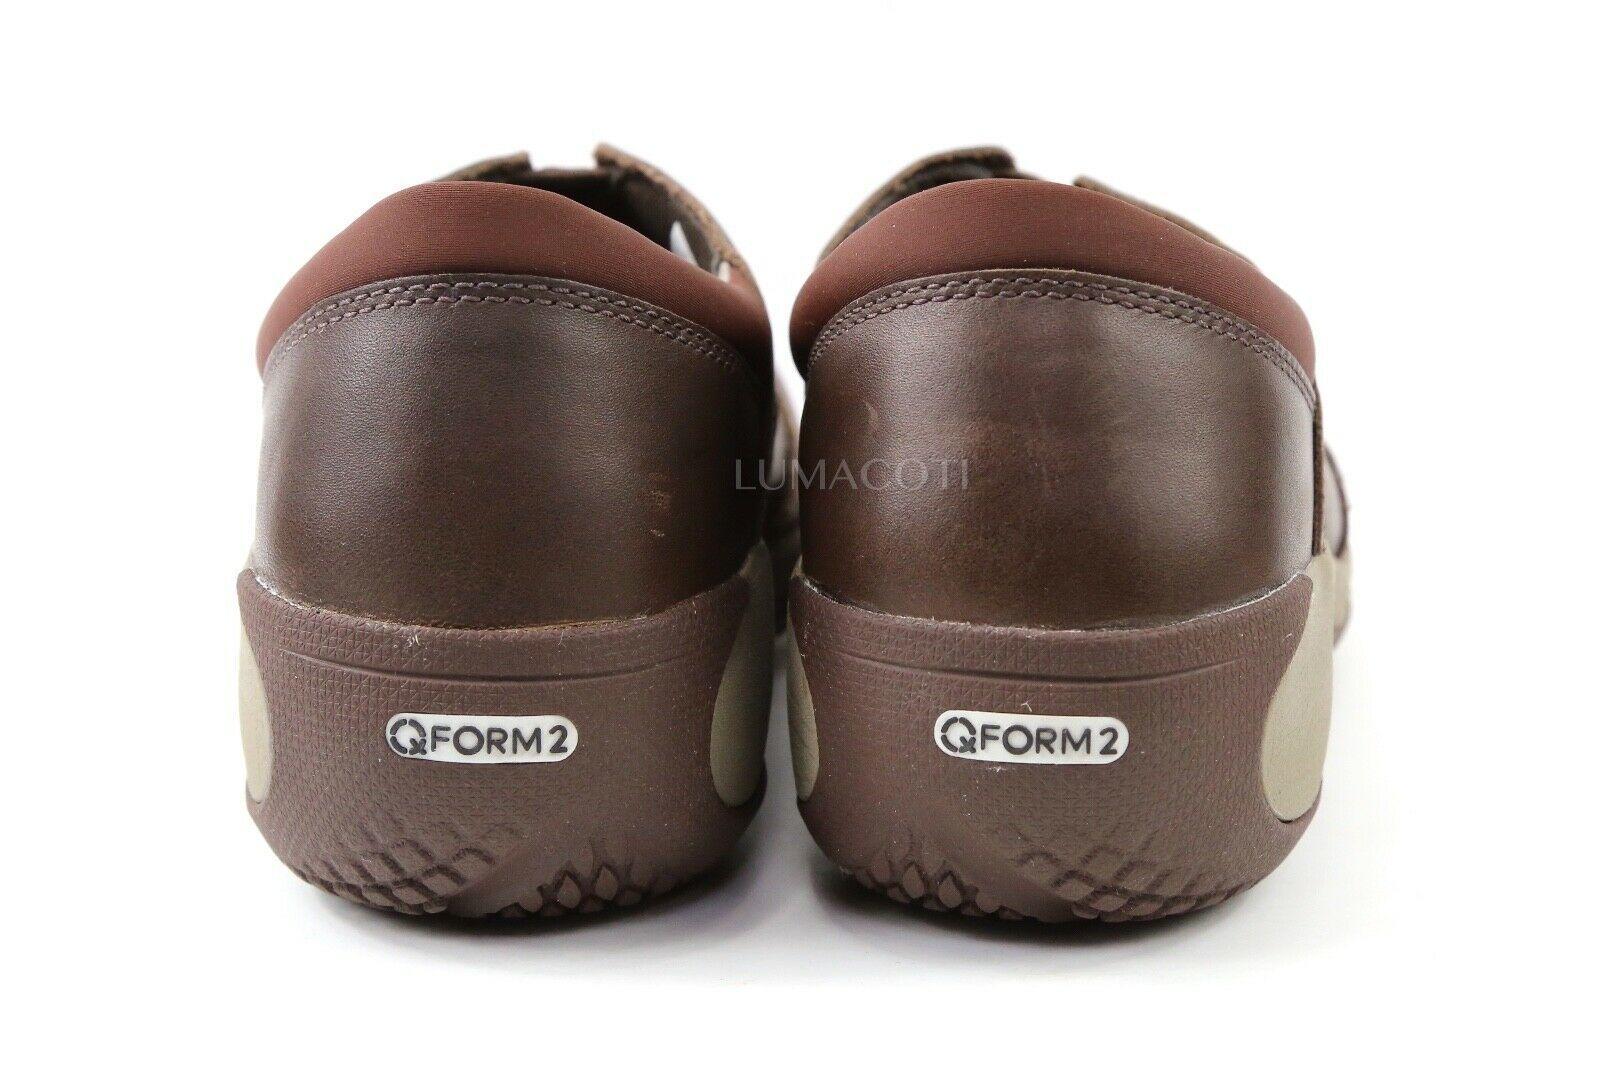 Womens Merrell Encore Q2 Moc Clog - Expresso Leather Size 10 [J45796]